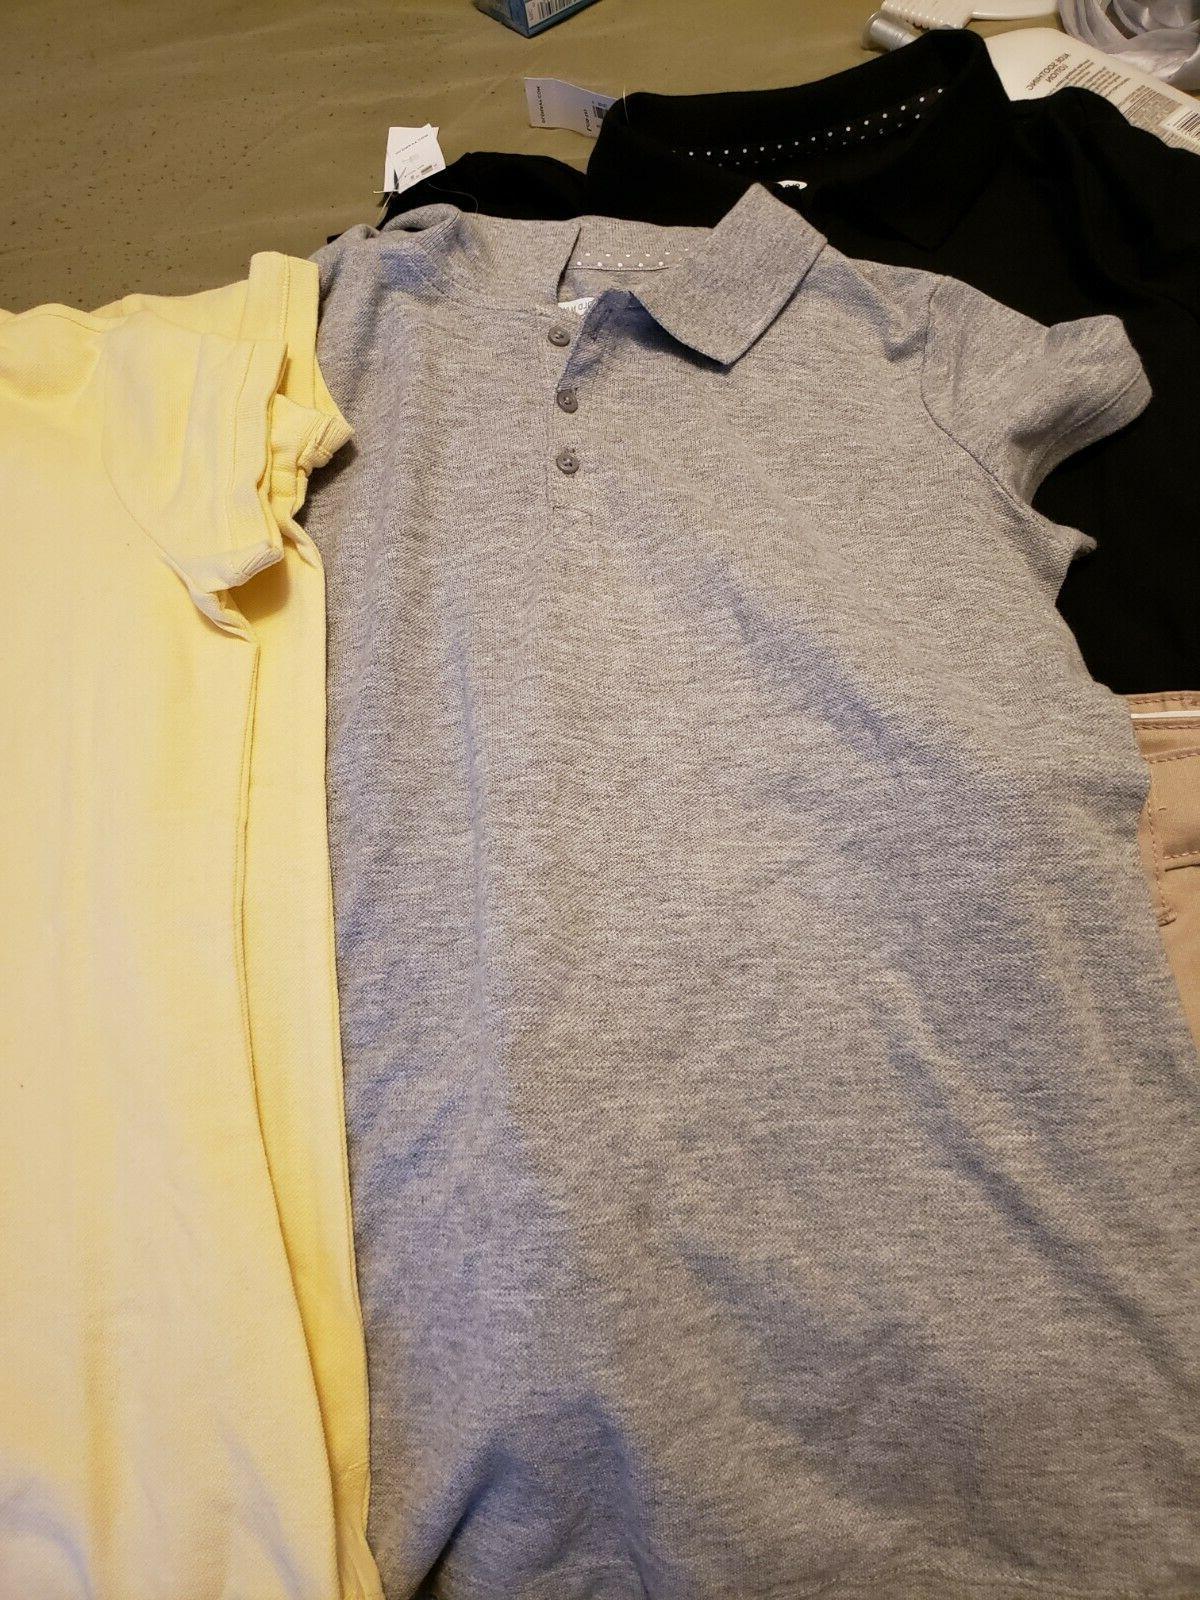 School uniform 2 Grey shirts, 1 black shirt 2 khaki shoes